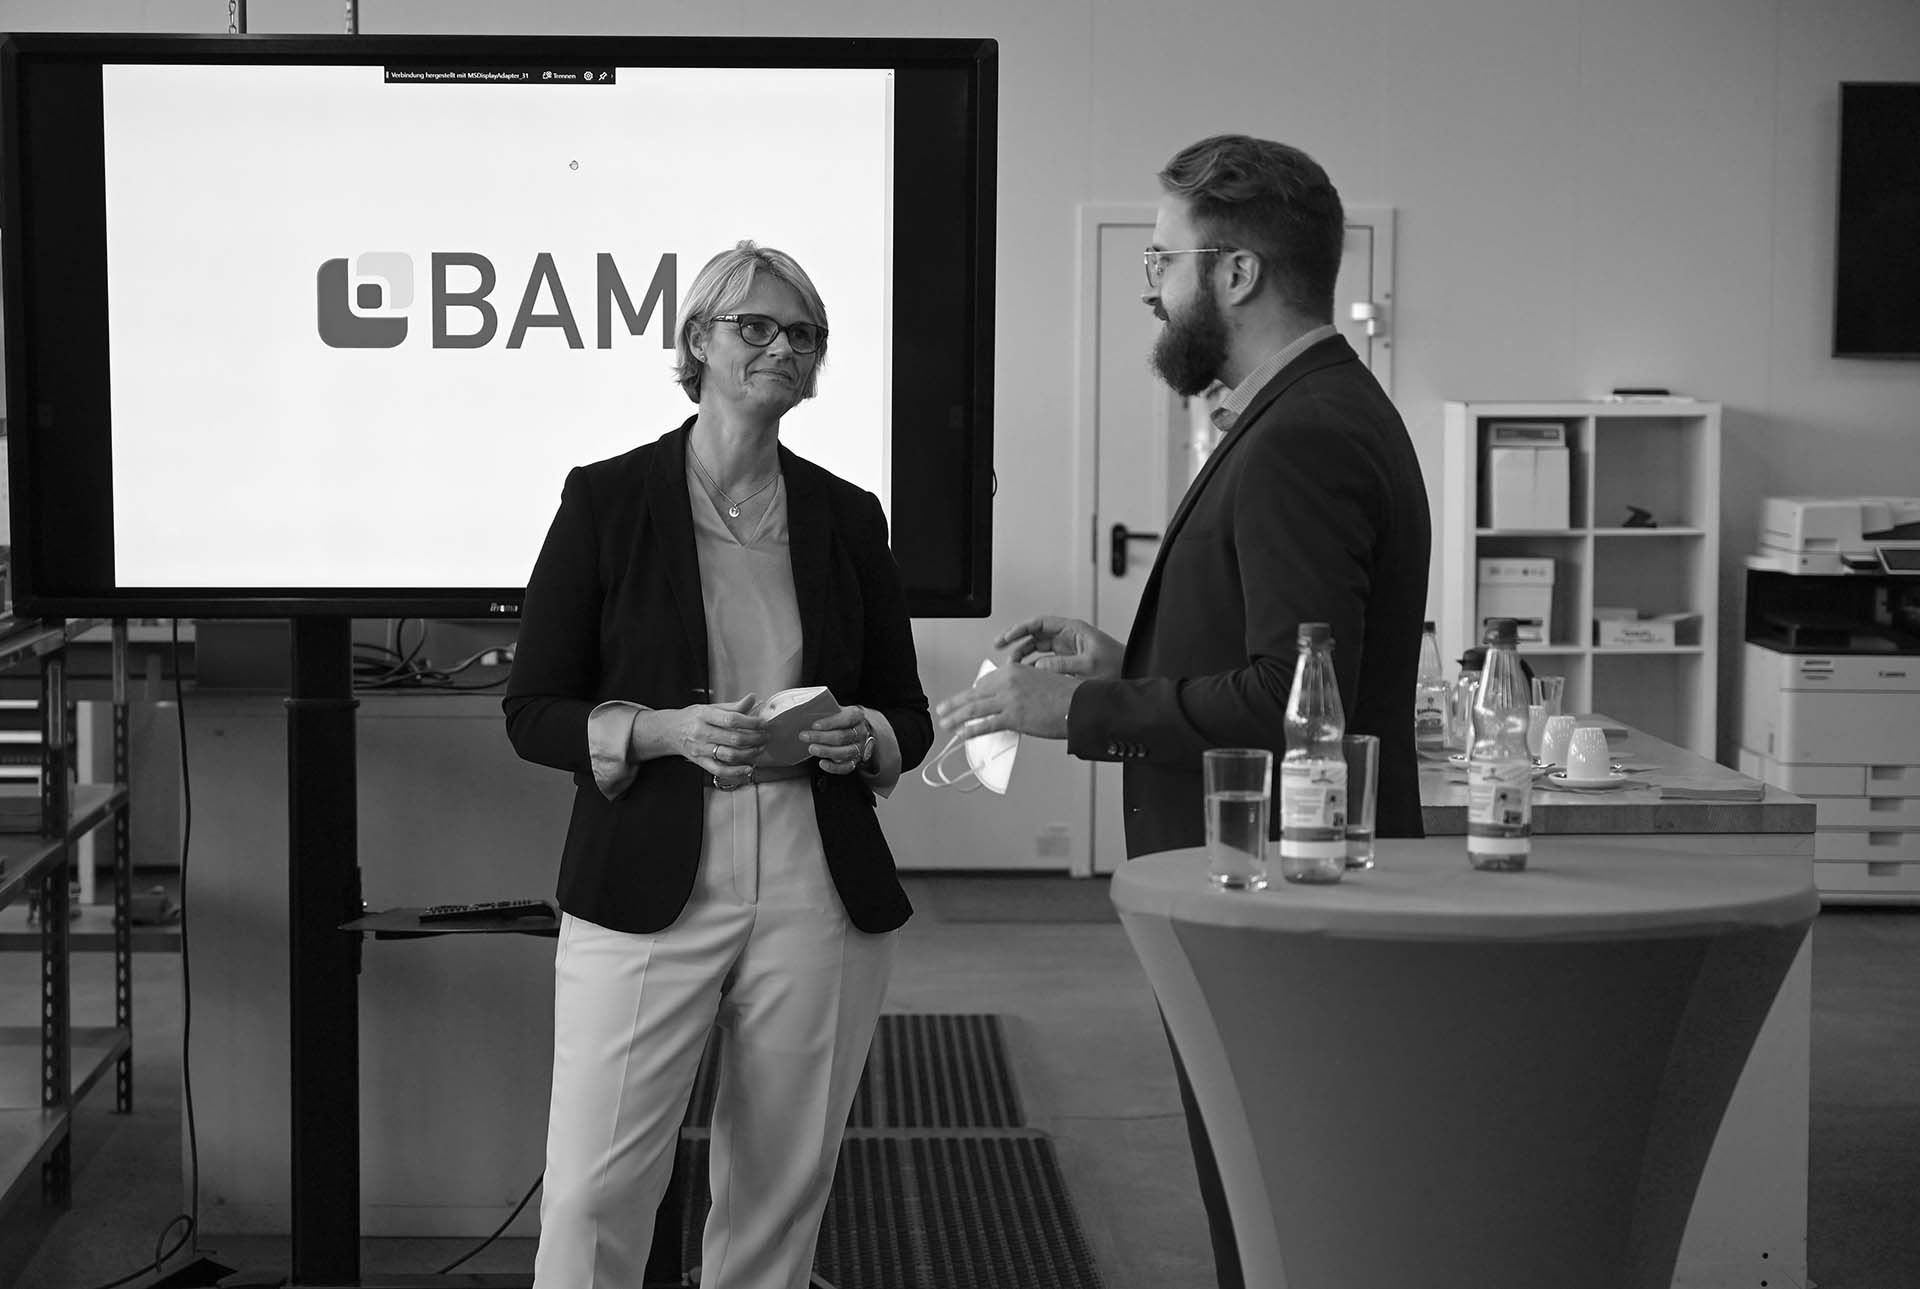 Bundesministerin-Anja-Karliczek-zu-Besuch-bei-BAM.jpg